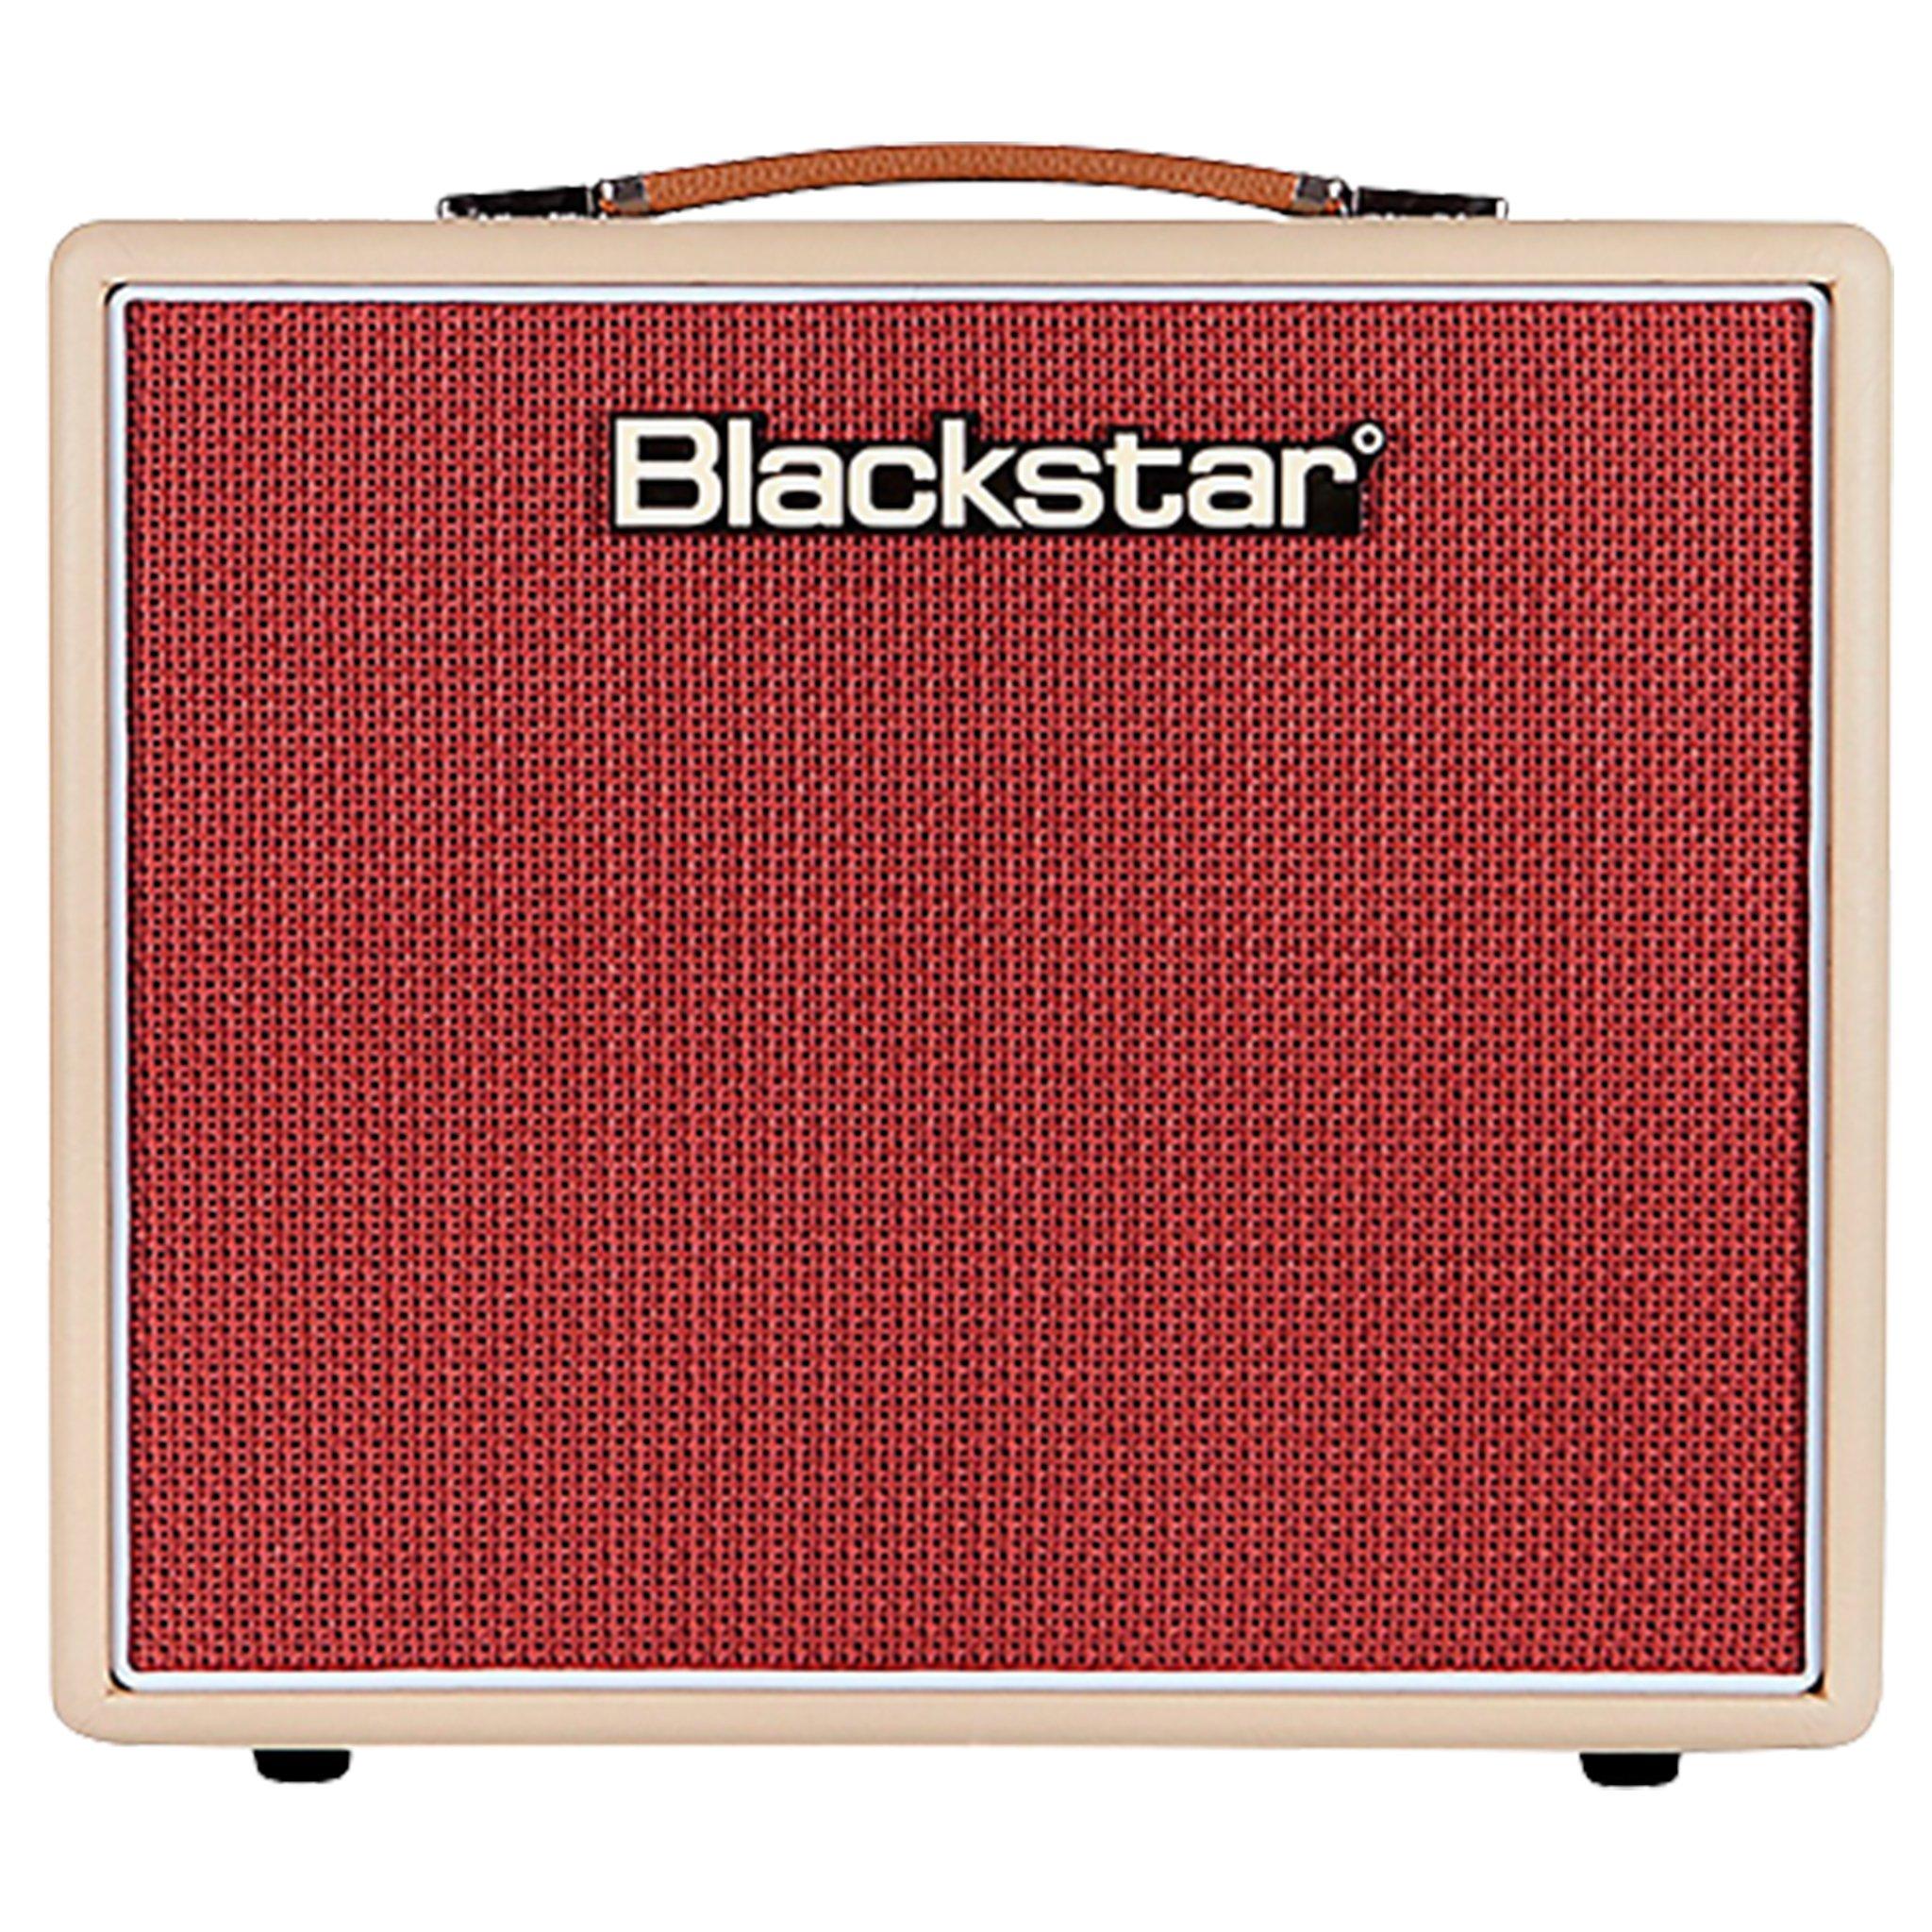 Blackstar Studio 10 6L6 Tube Combo Guitar Amplifier10 watts